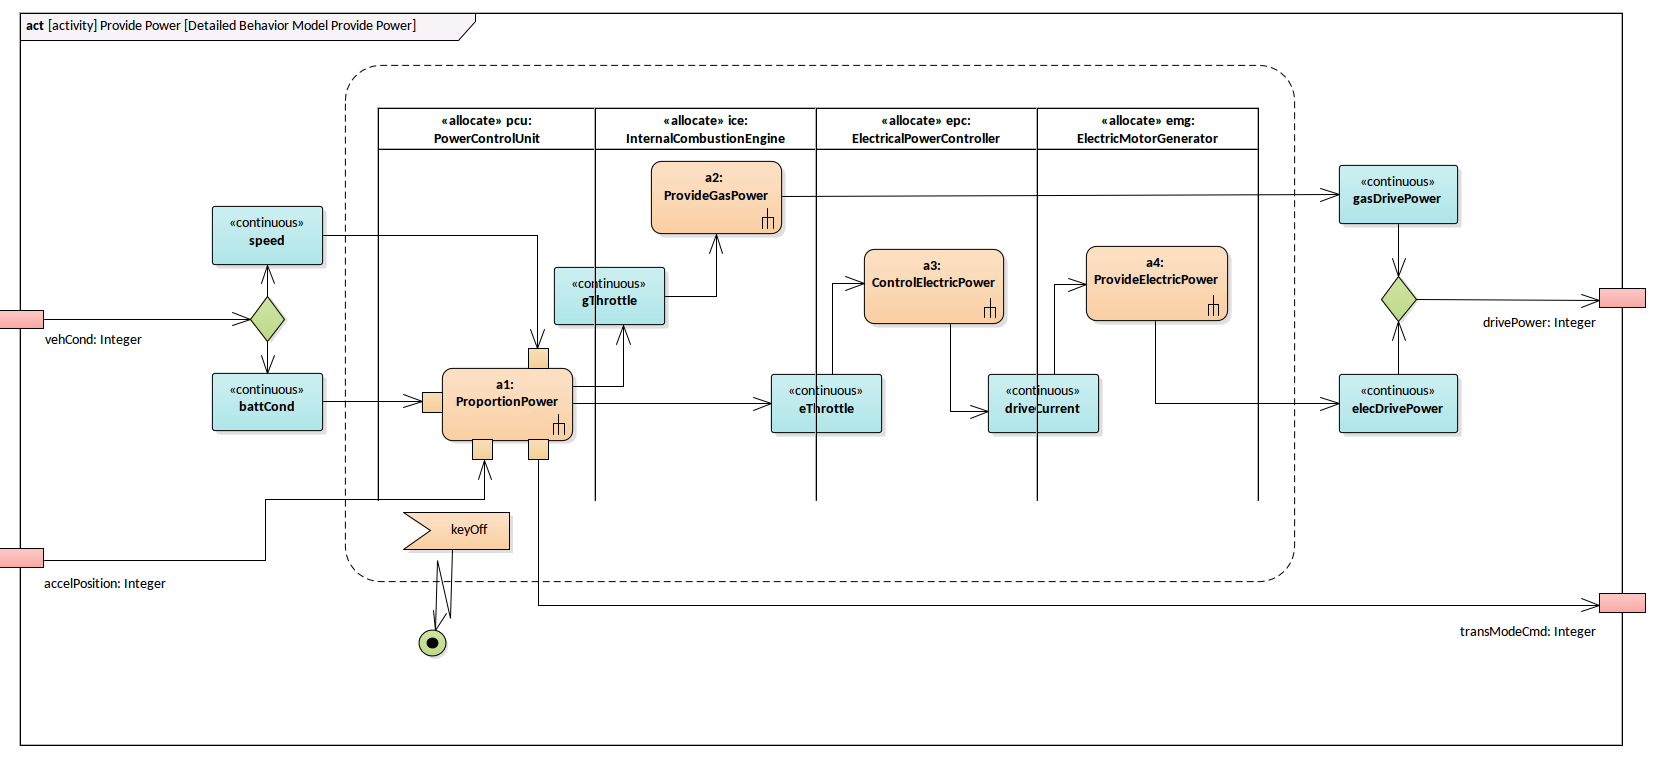 Sysml Activity Diagram Provide Power Enterprise Architect Diagrams Gallery